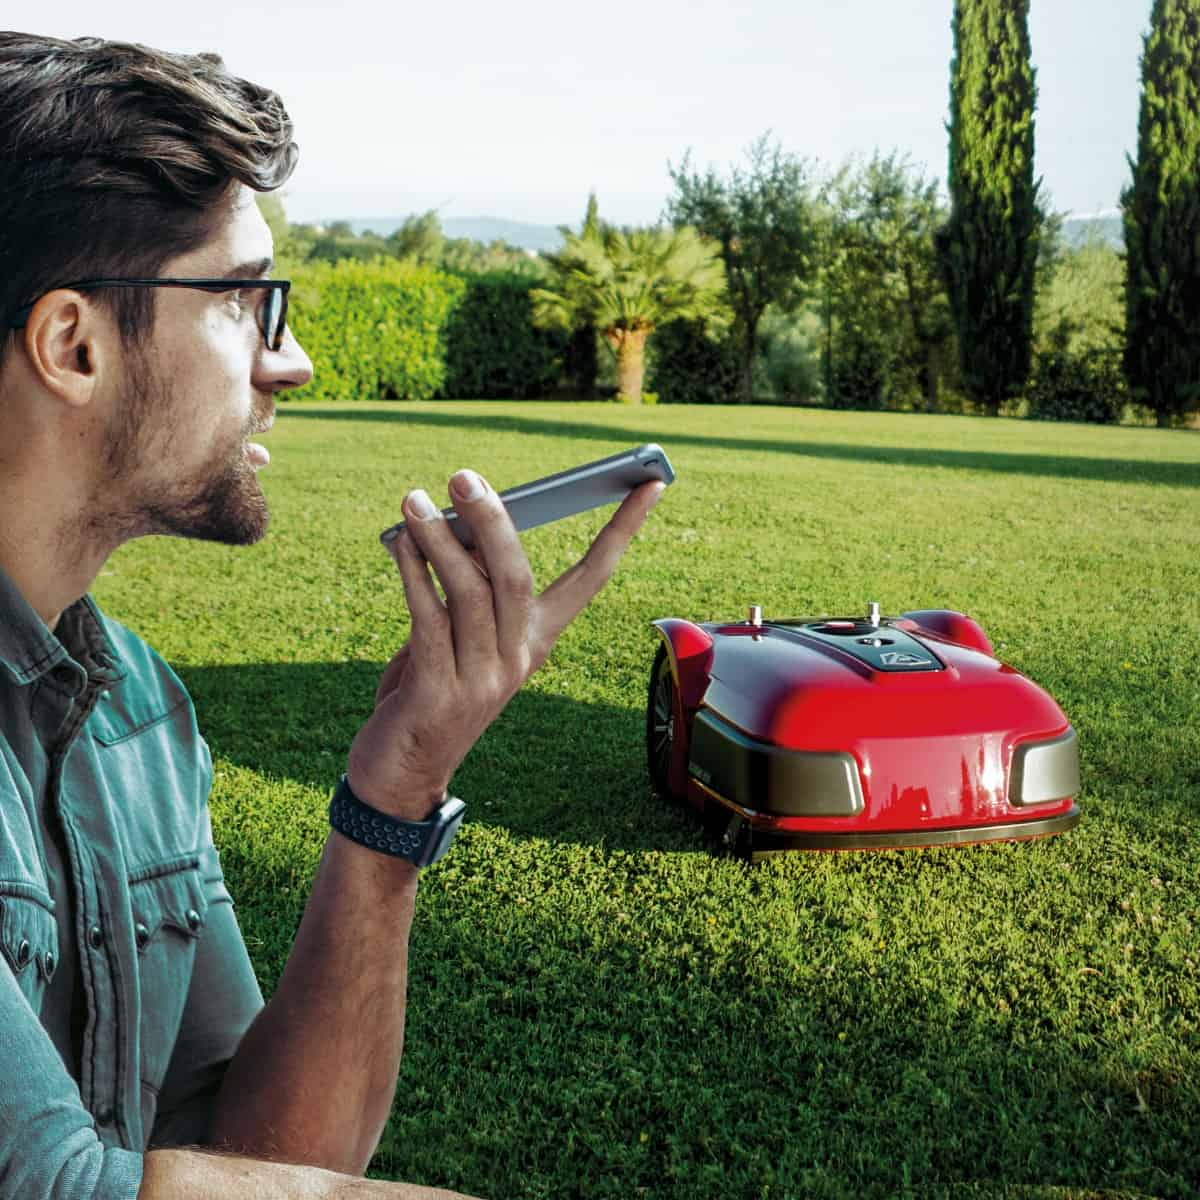 PRO Line Ambrogio Lawn Mower Range